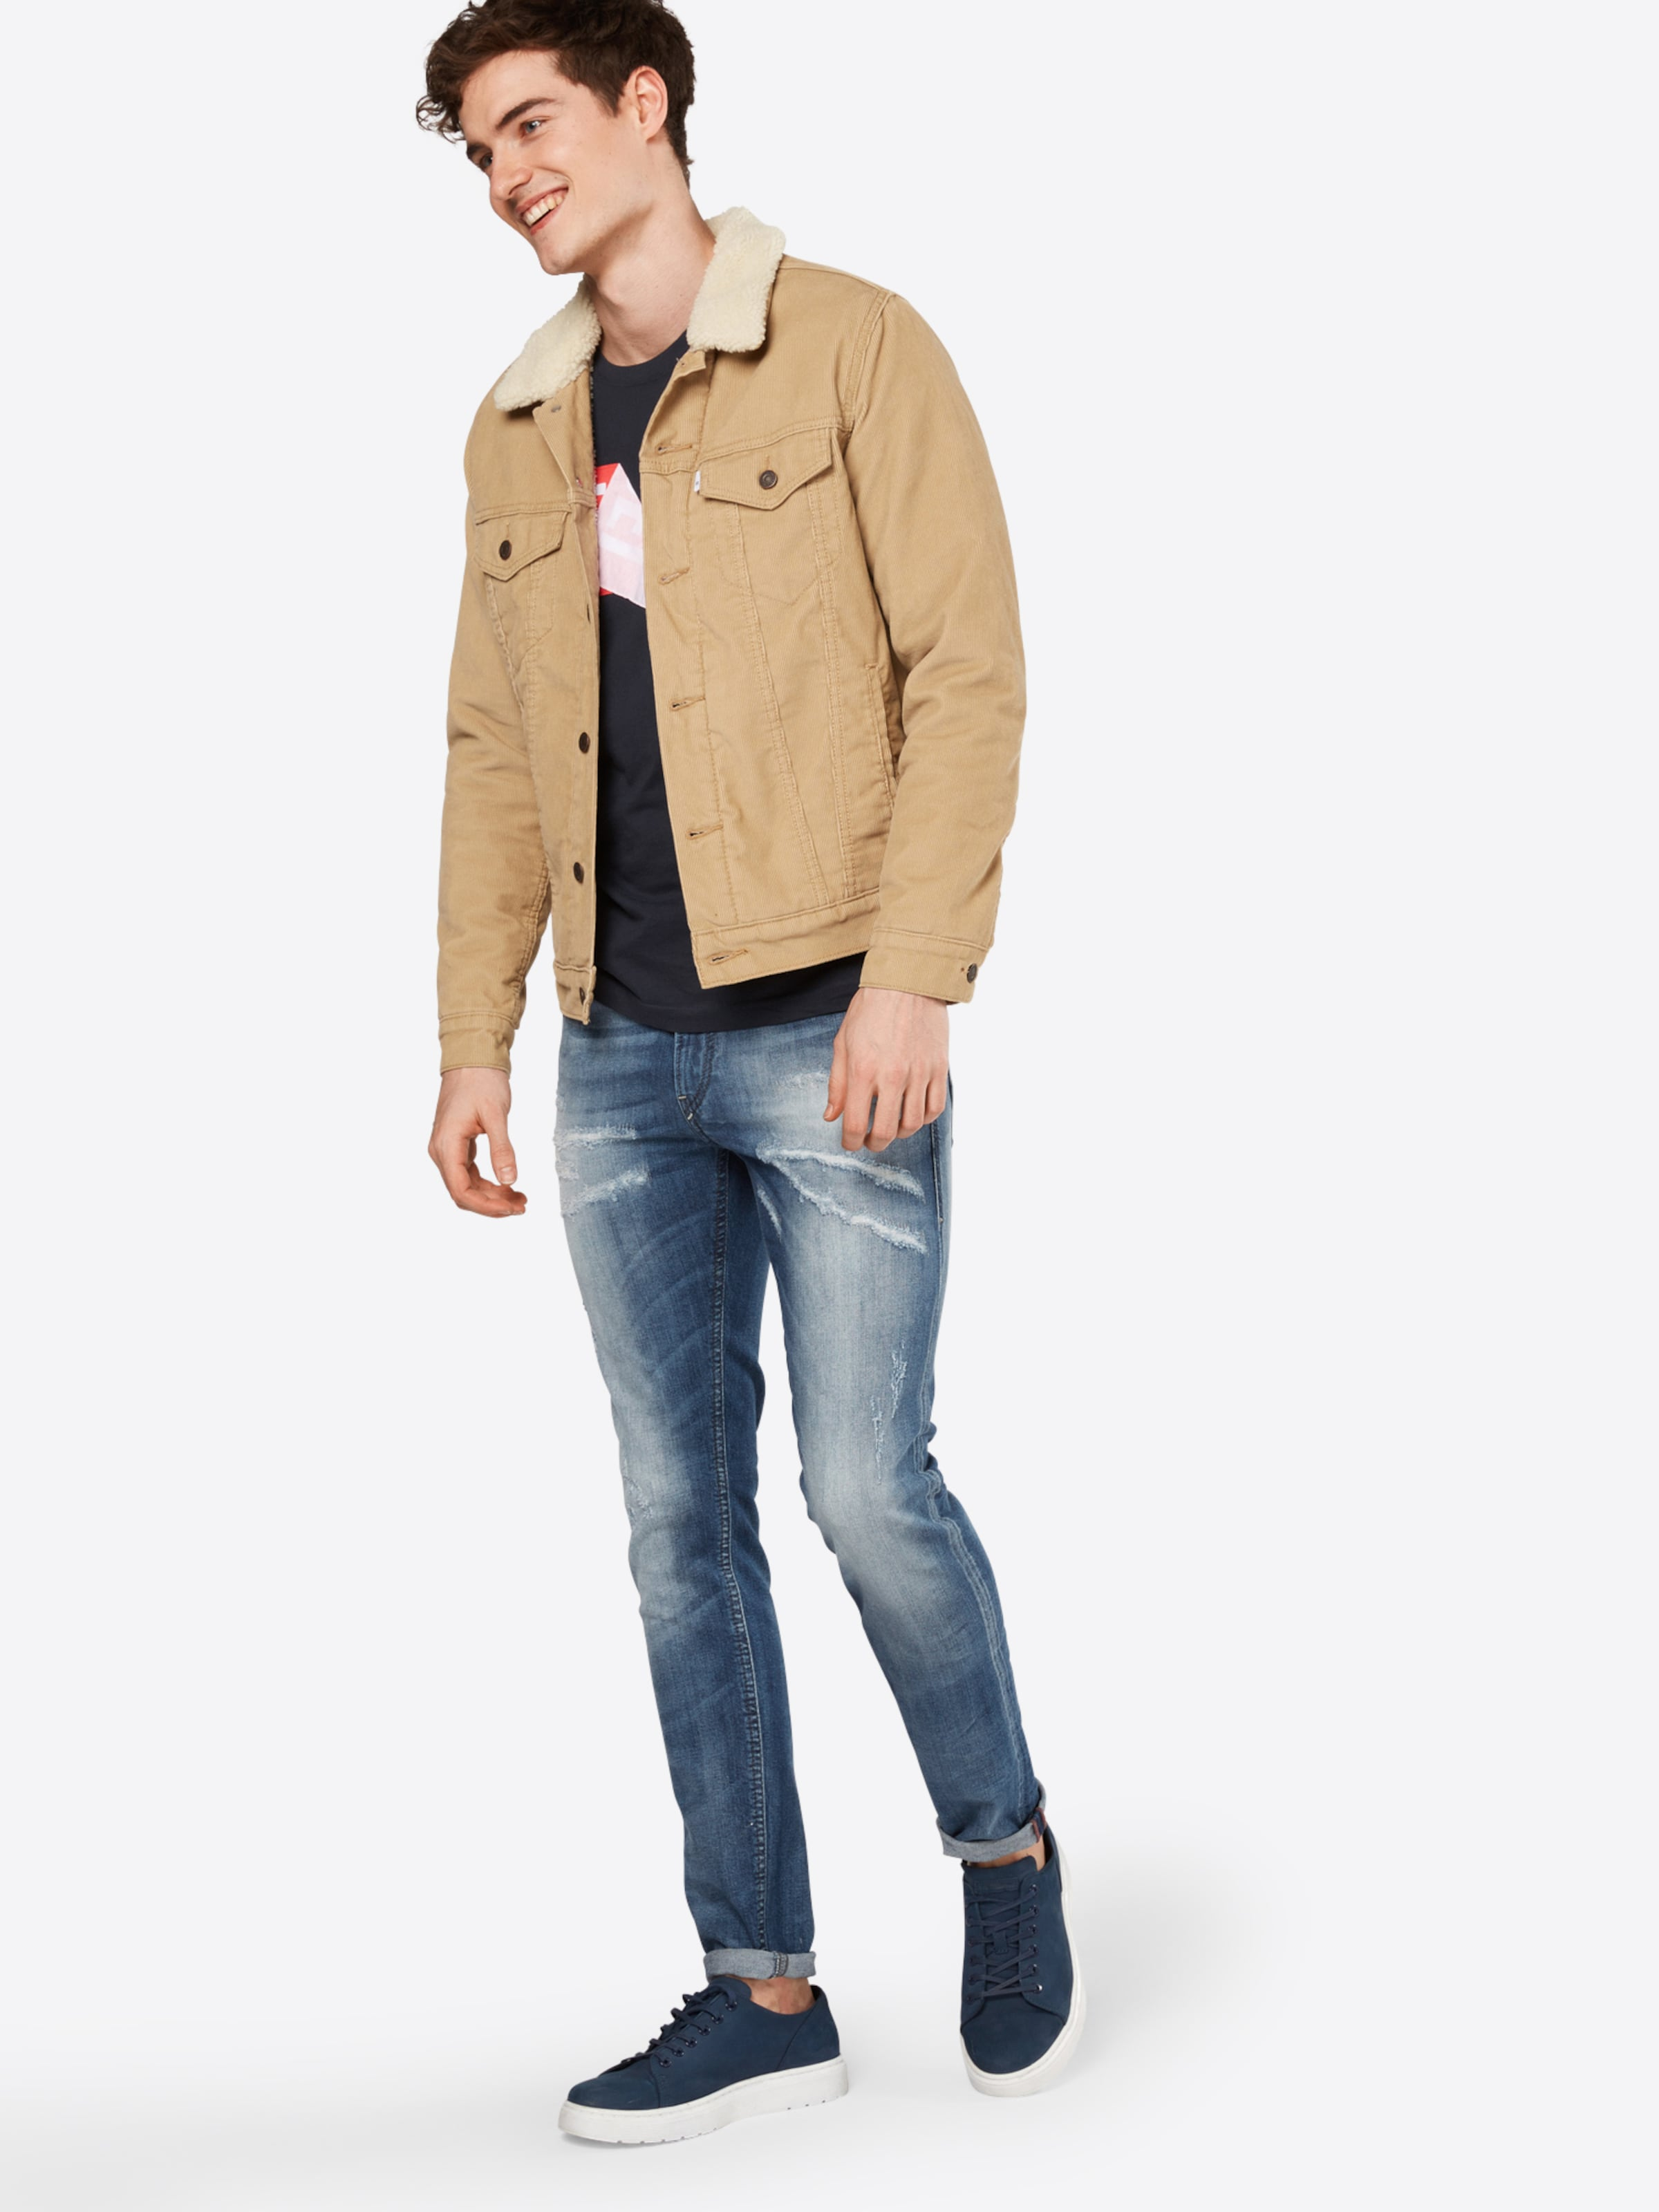 DIESEL 'Thommer' Jeans Skinny Fit 845F Steckdose Exklusive Verkauf Truhe Finish pyHAdKhFb